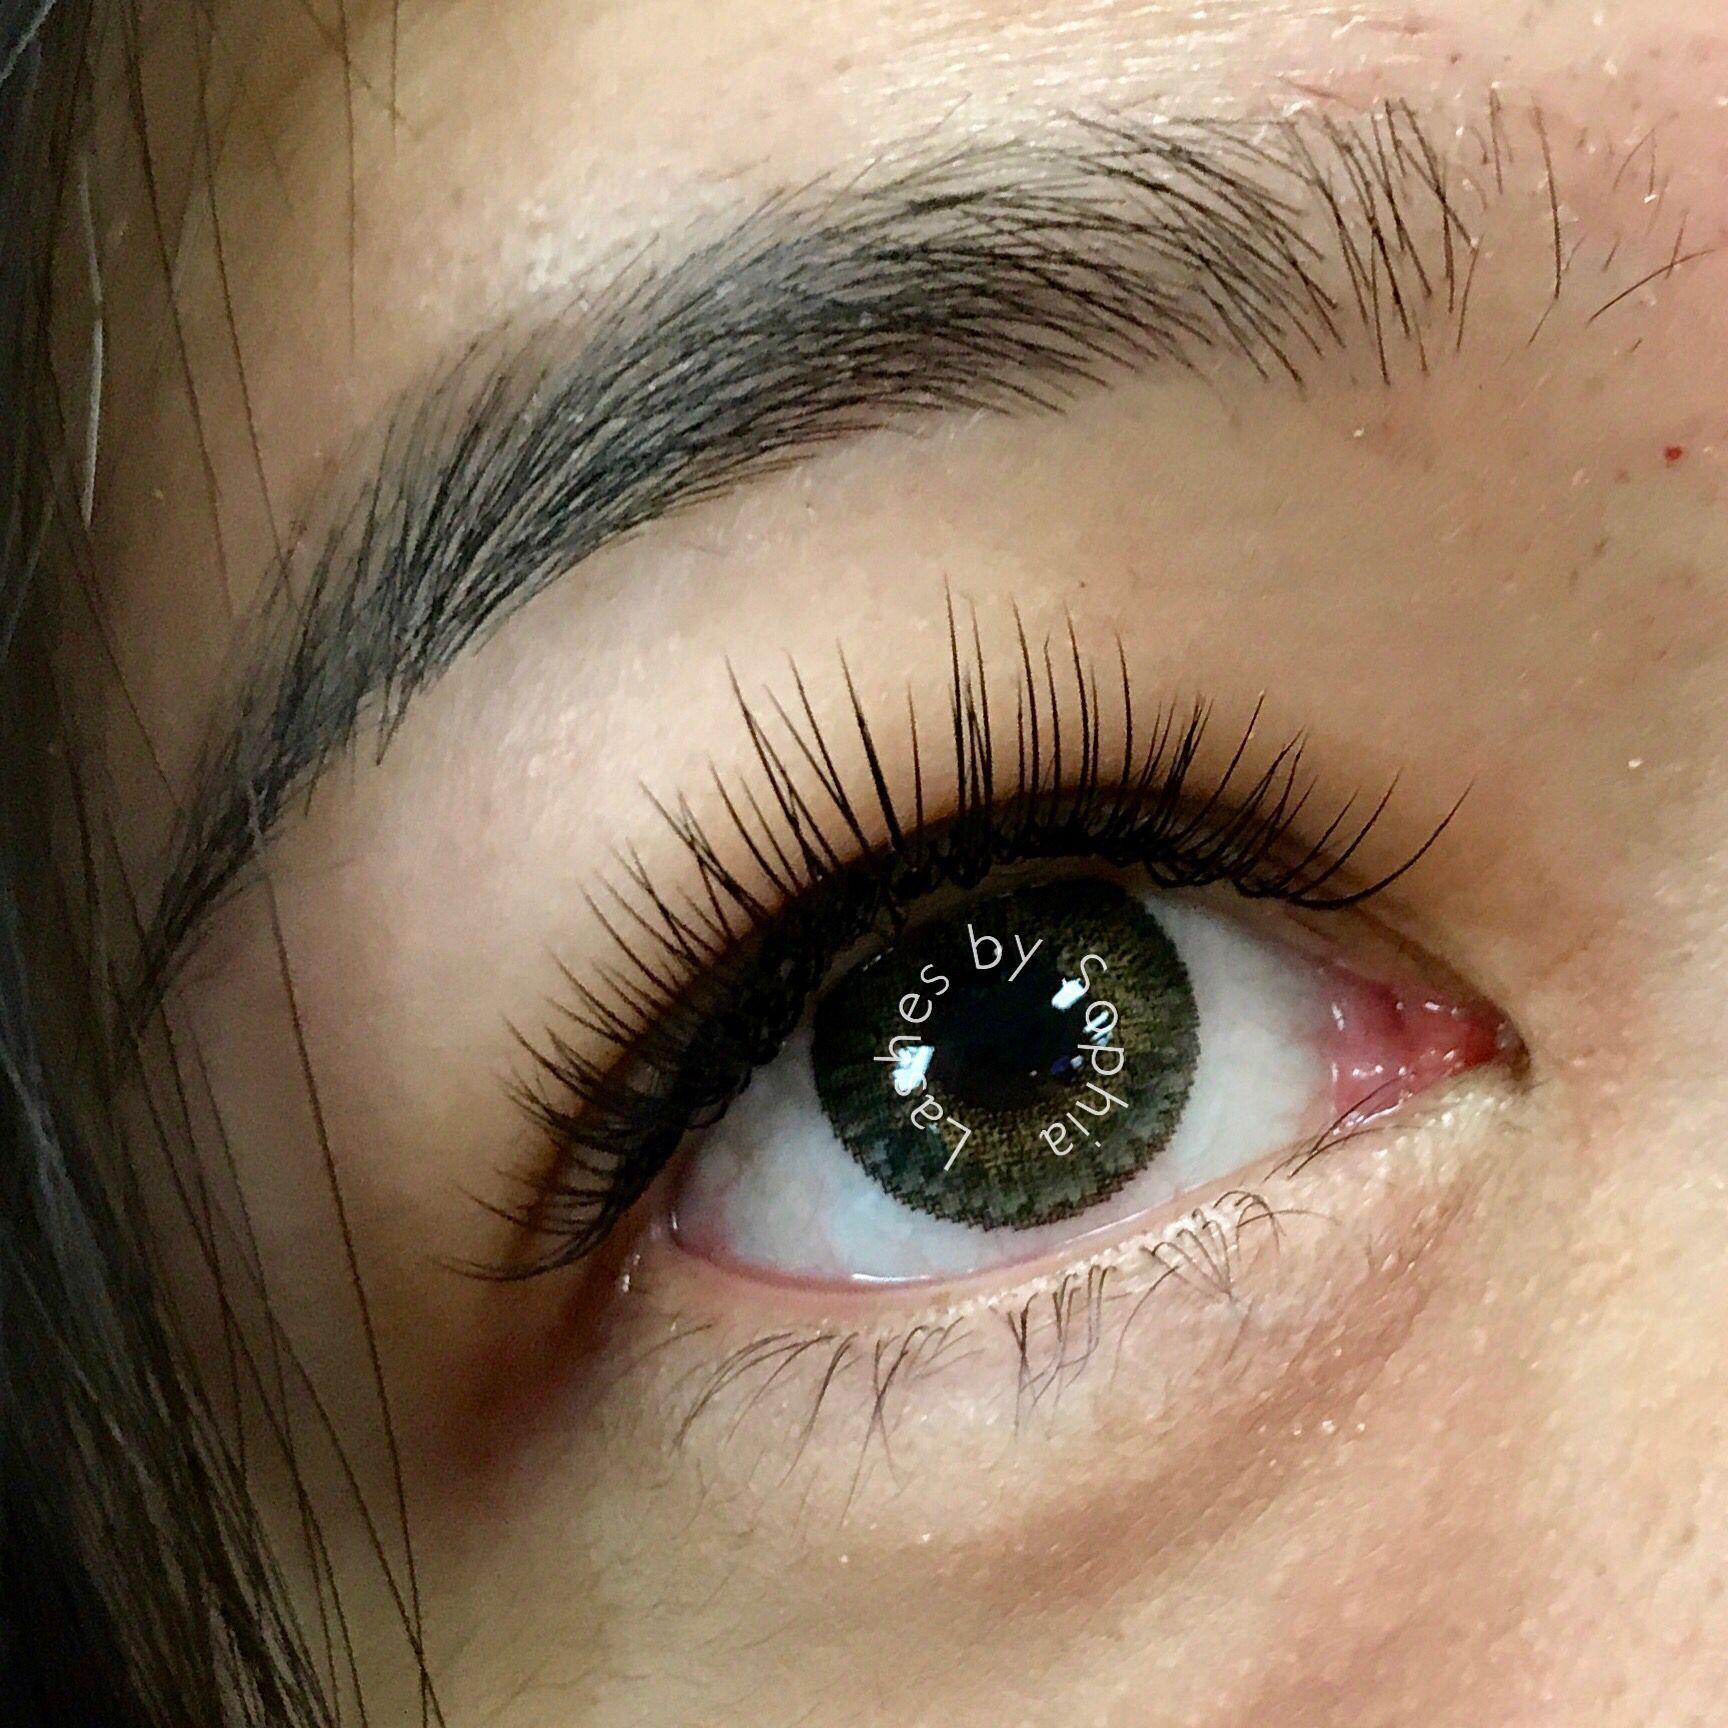 When Done Right Lashes Should Be Seen Even On Hooded Eyes Eyelashesextensions Hooded Eyes Lashes Best False Eyelashes